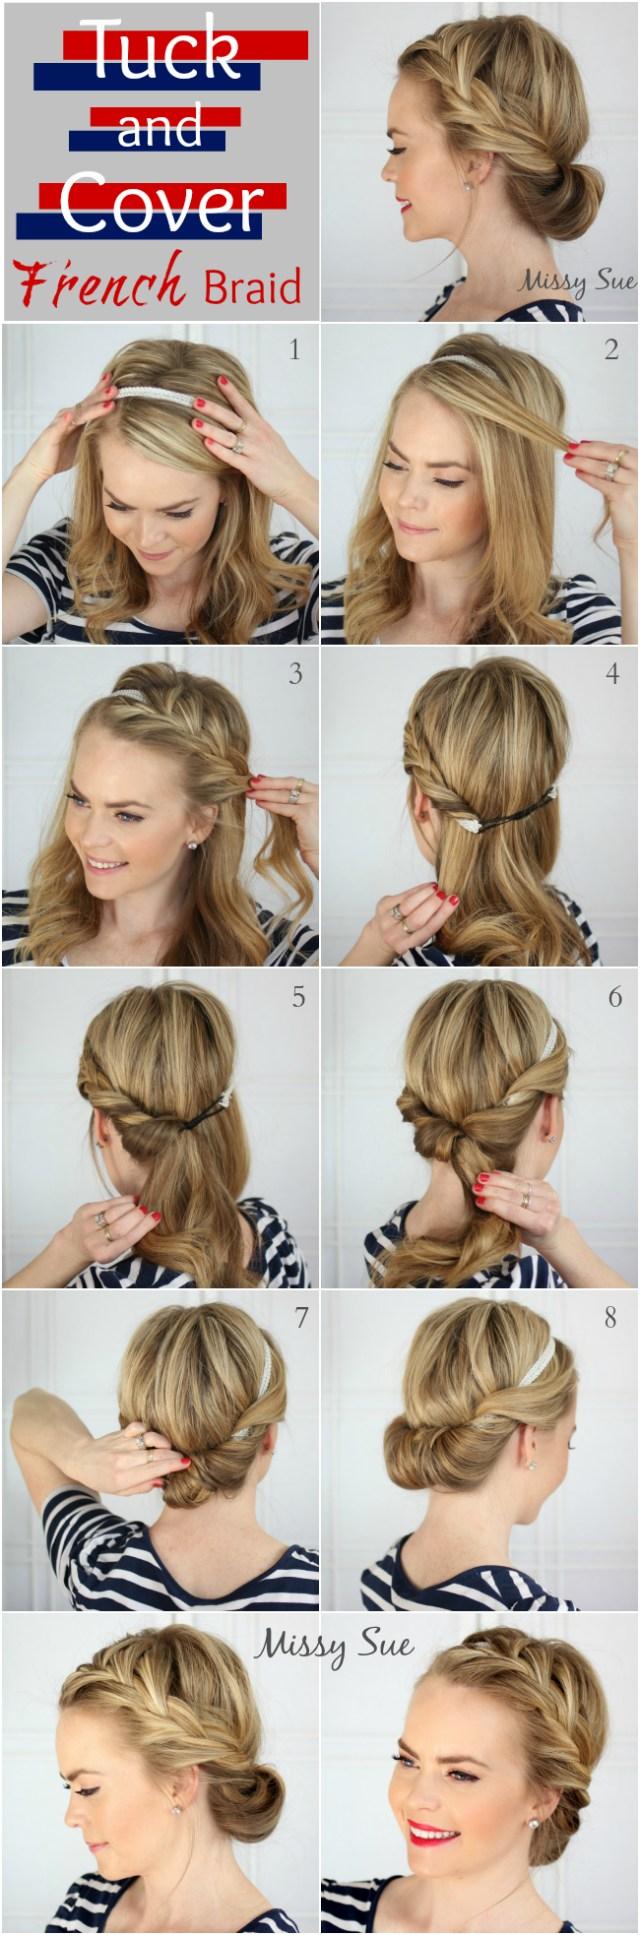 Diy Wedding Updos 10 Best Diy Wedding Hairstyles With Tutorials Tulle Chantilly